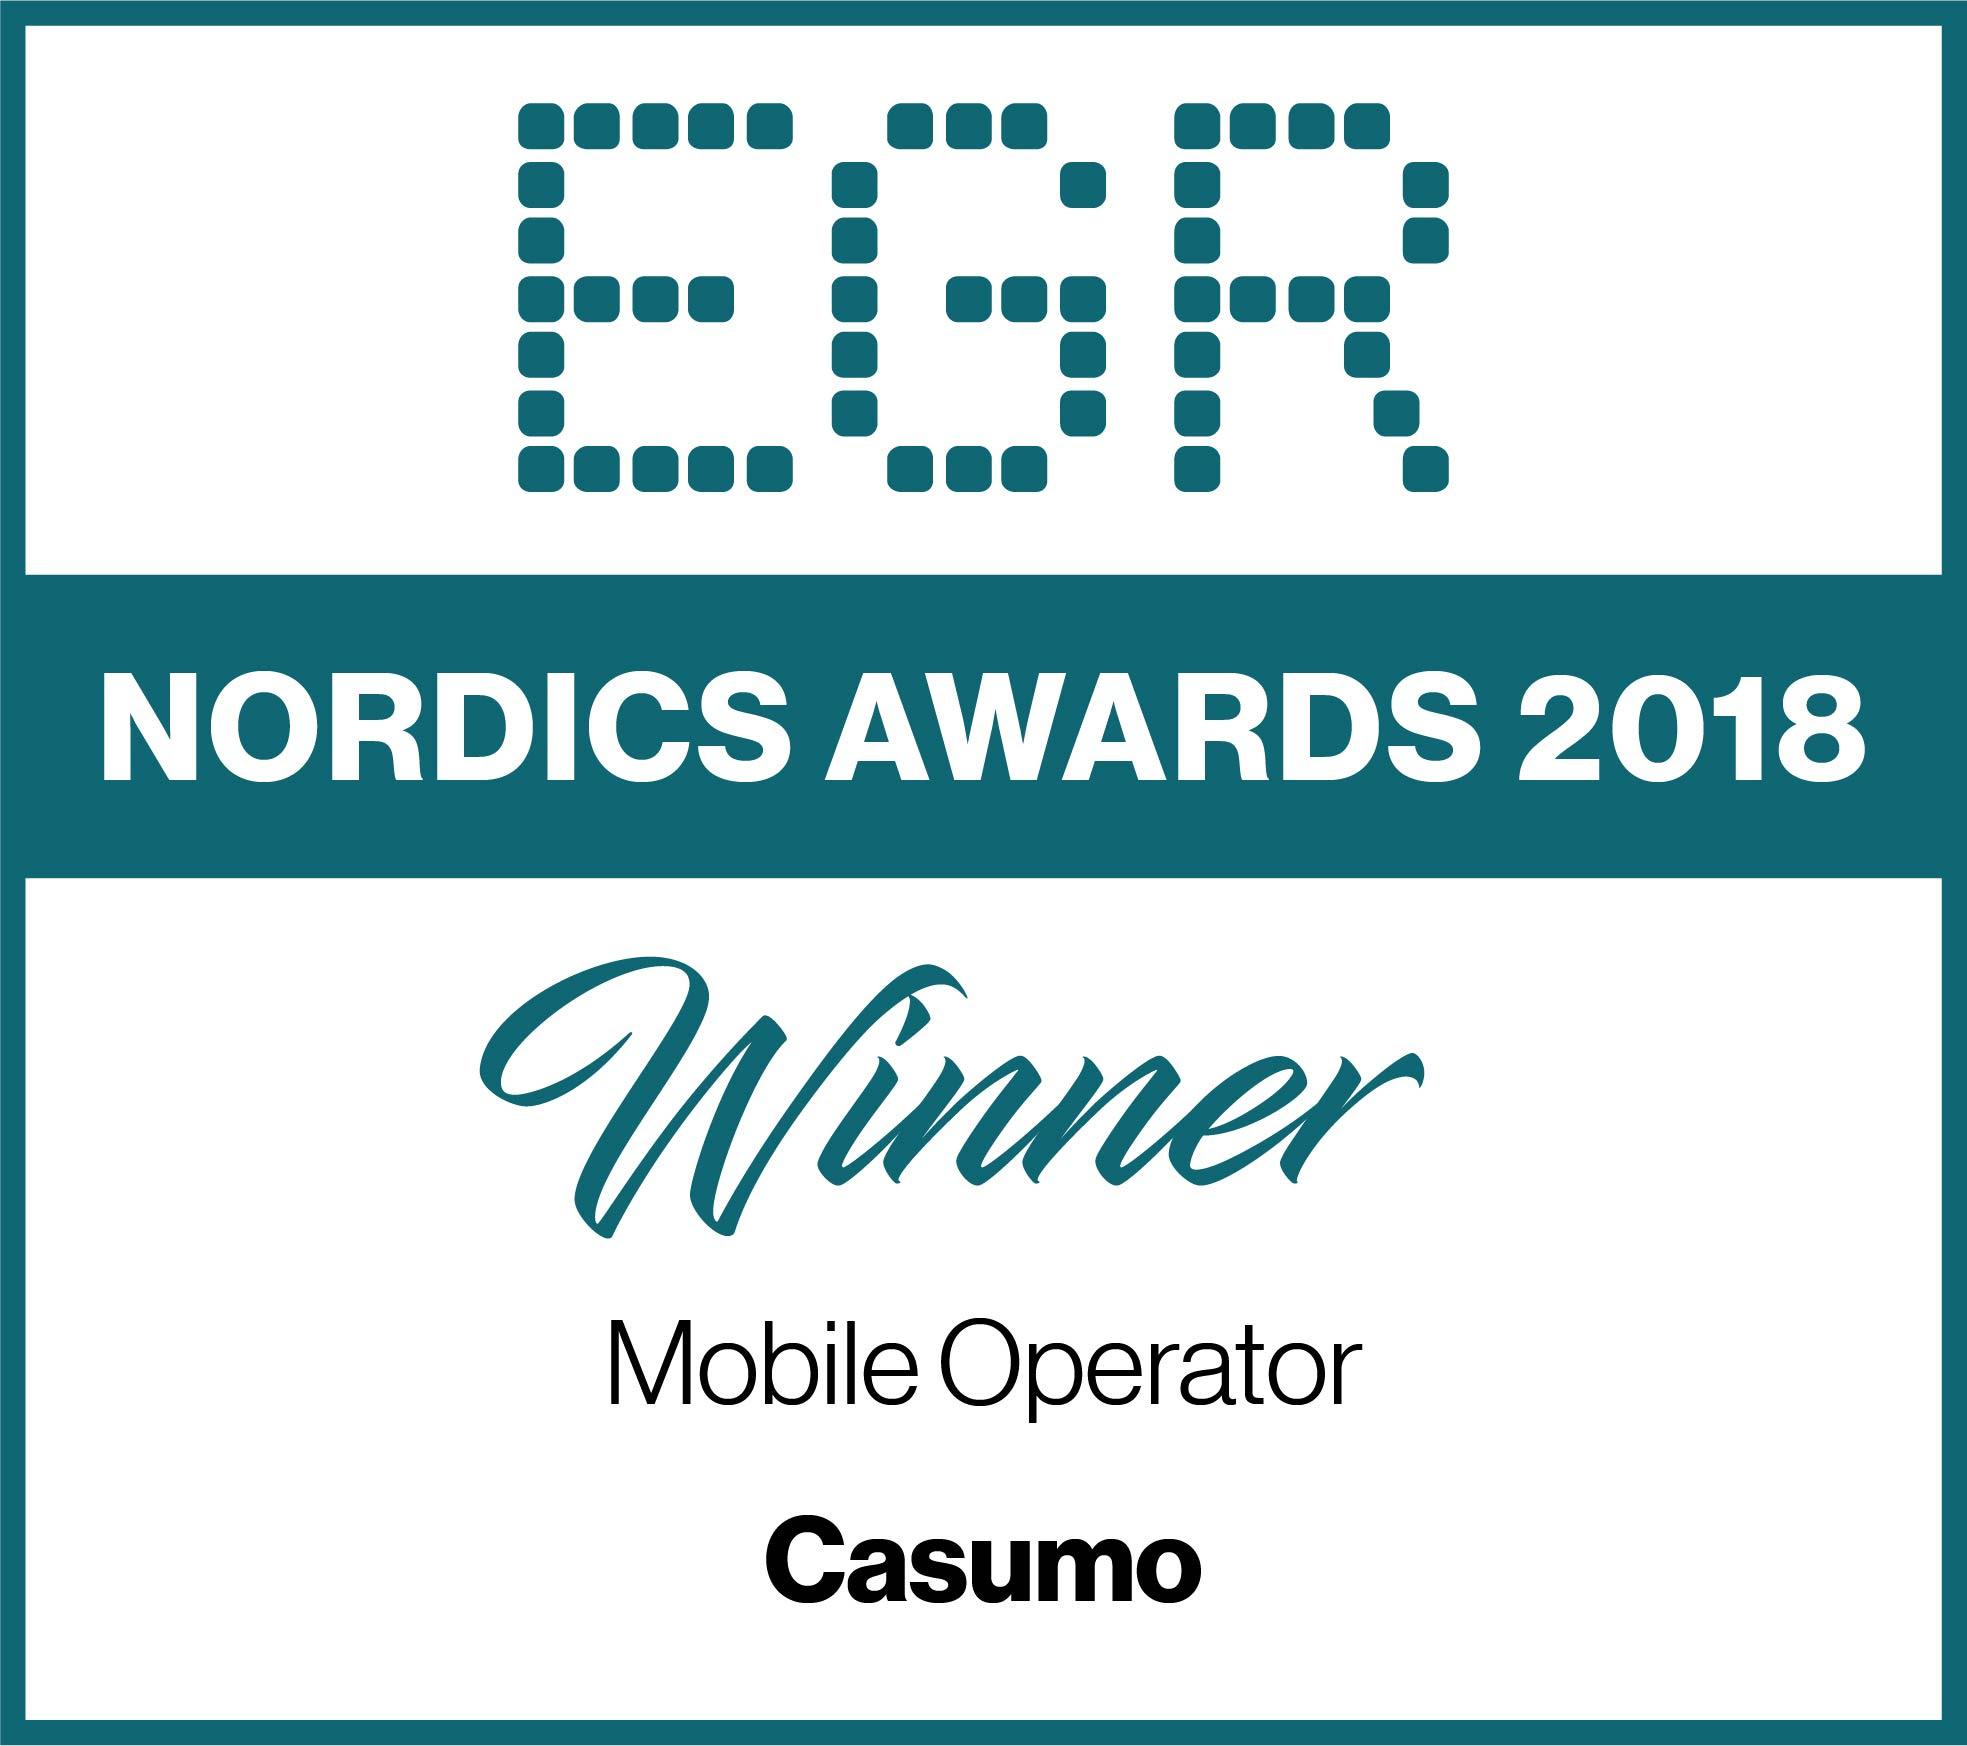 EGR Nordic Awards 2018 Casumo